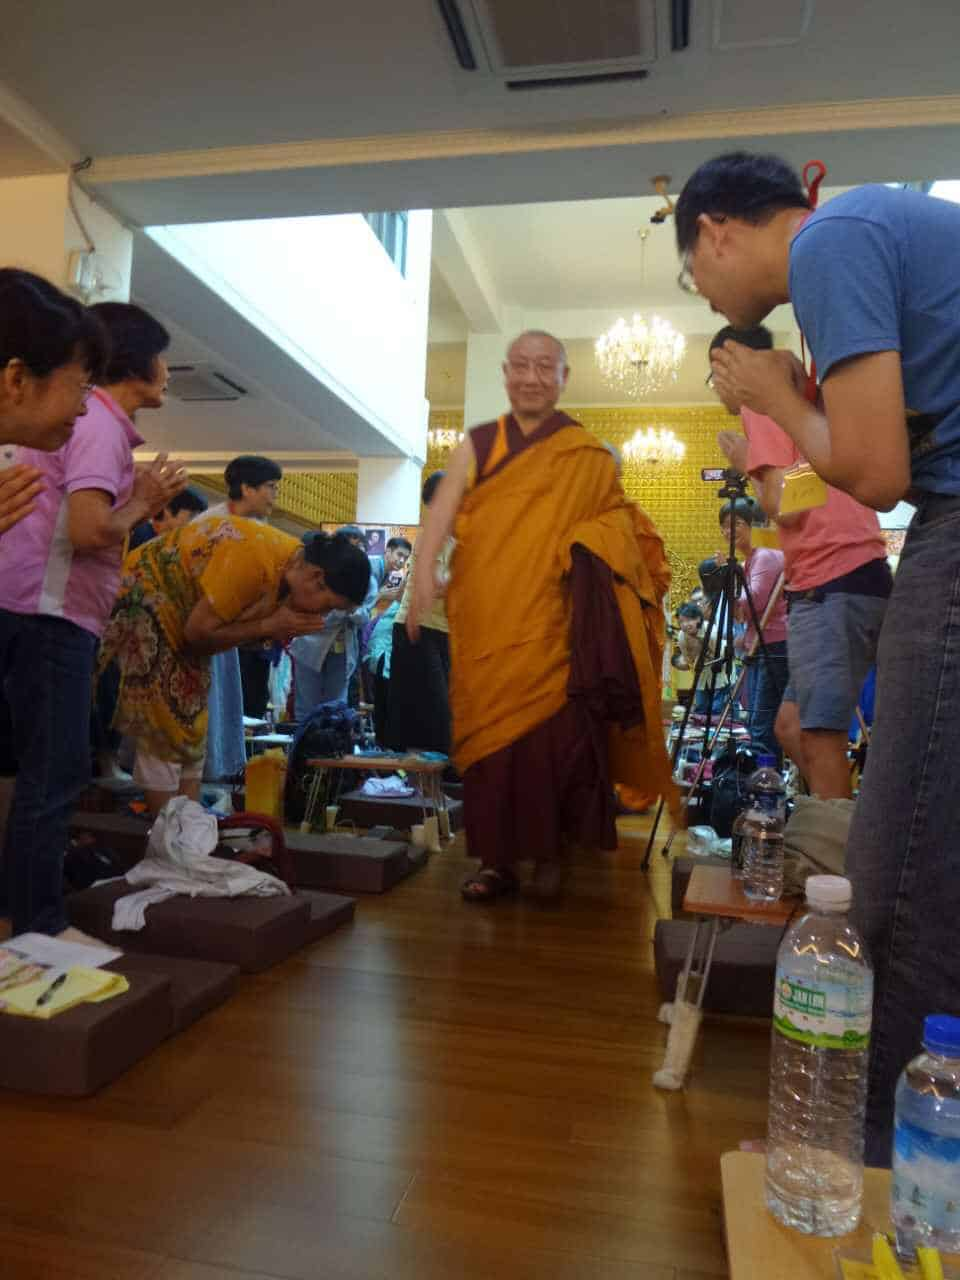 gosok-rinpoche-2016-10-a61850112abad8b1afda5fc5ec158f4b_